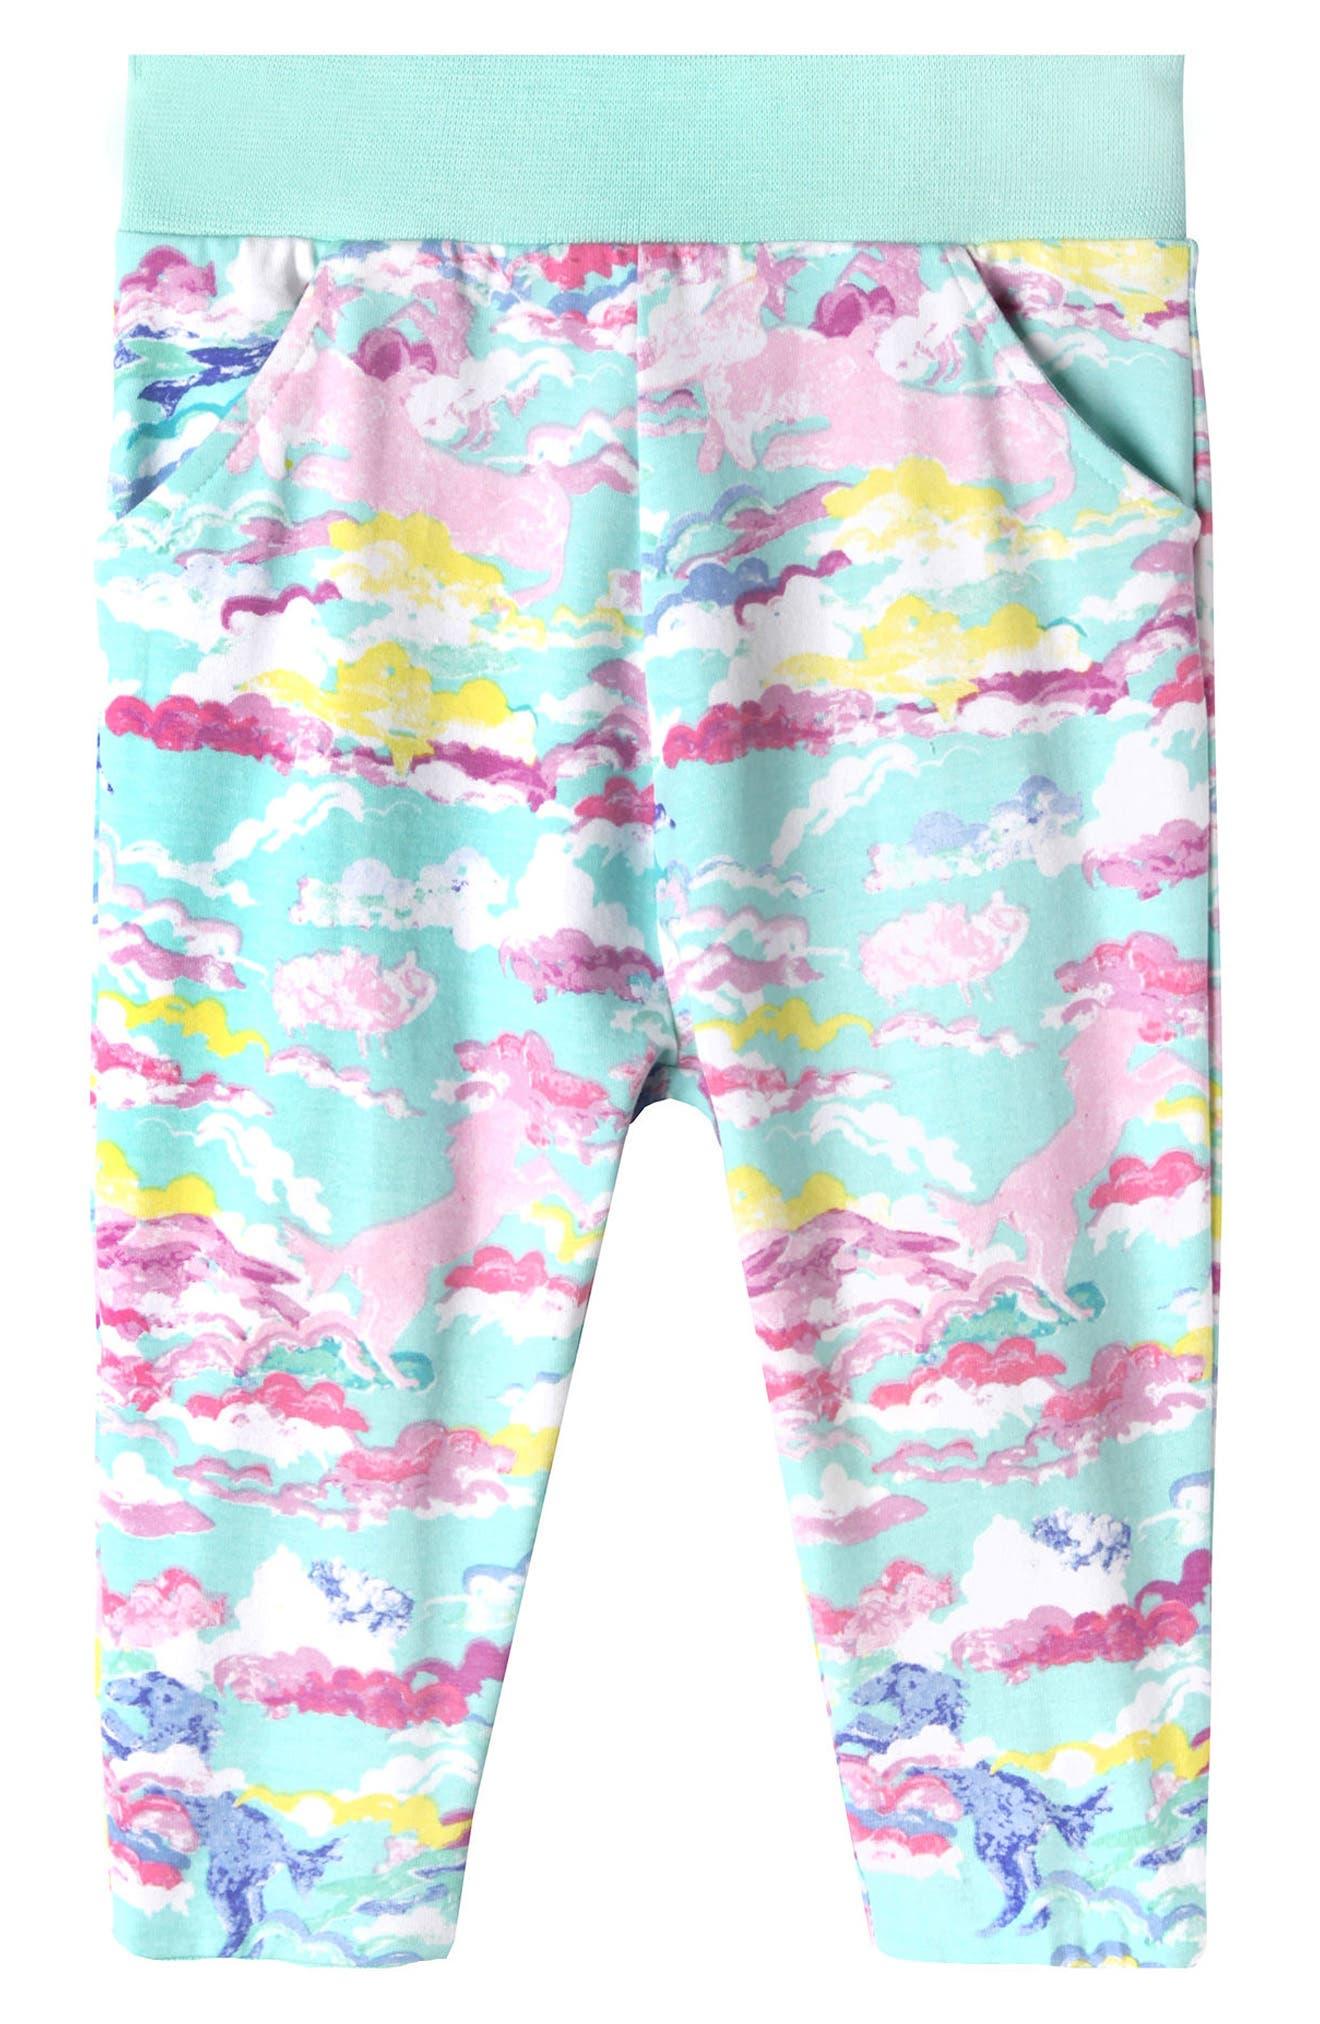 Lucy Day Dreamer Leggings,                         Main,                         color, Day Dreamer